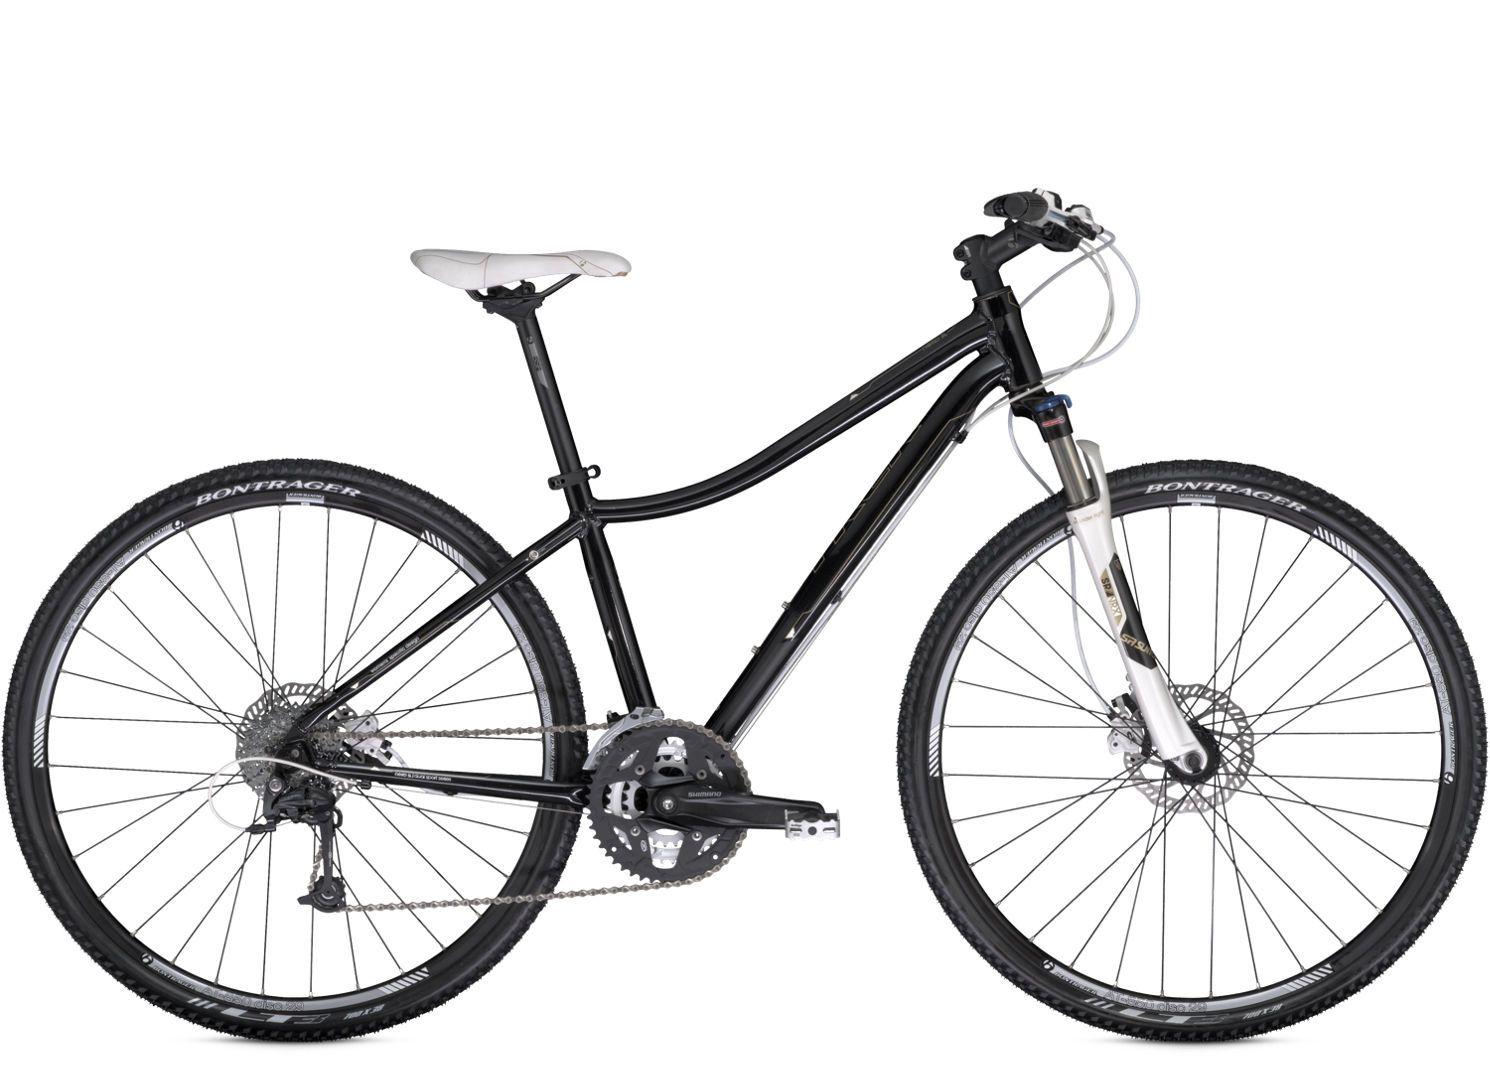 Neko SL Trek Bicycle Trek bicycle, Trek mountain bike